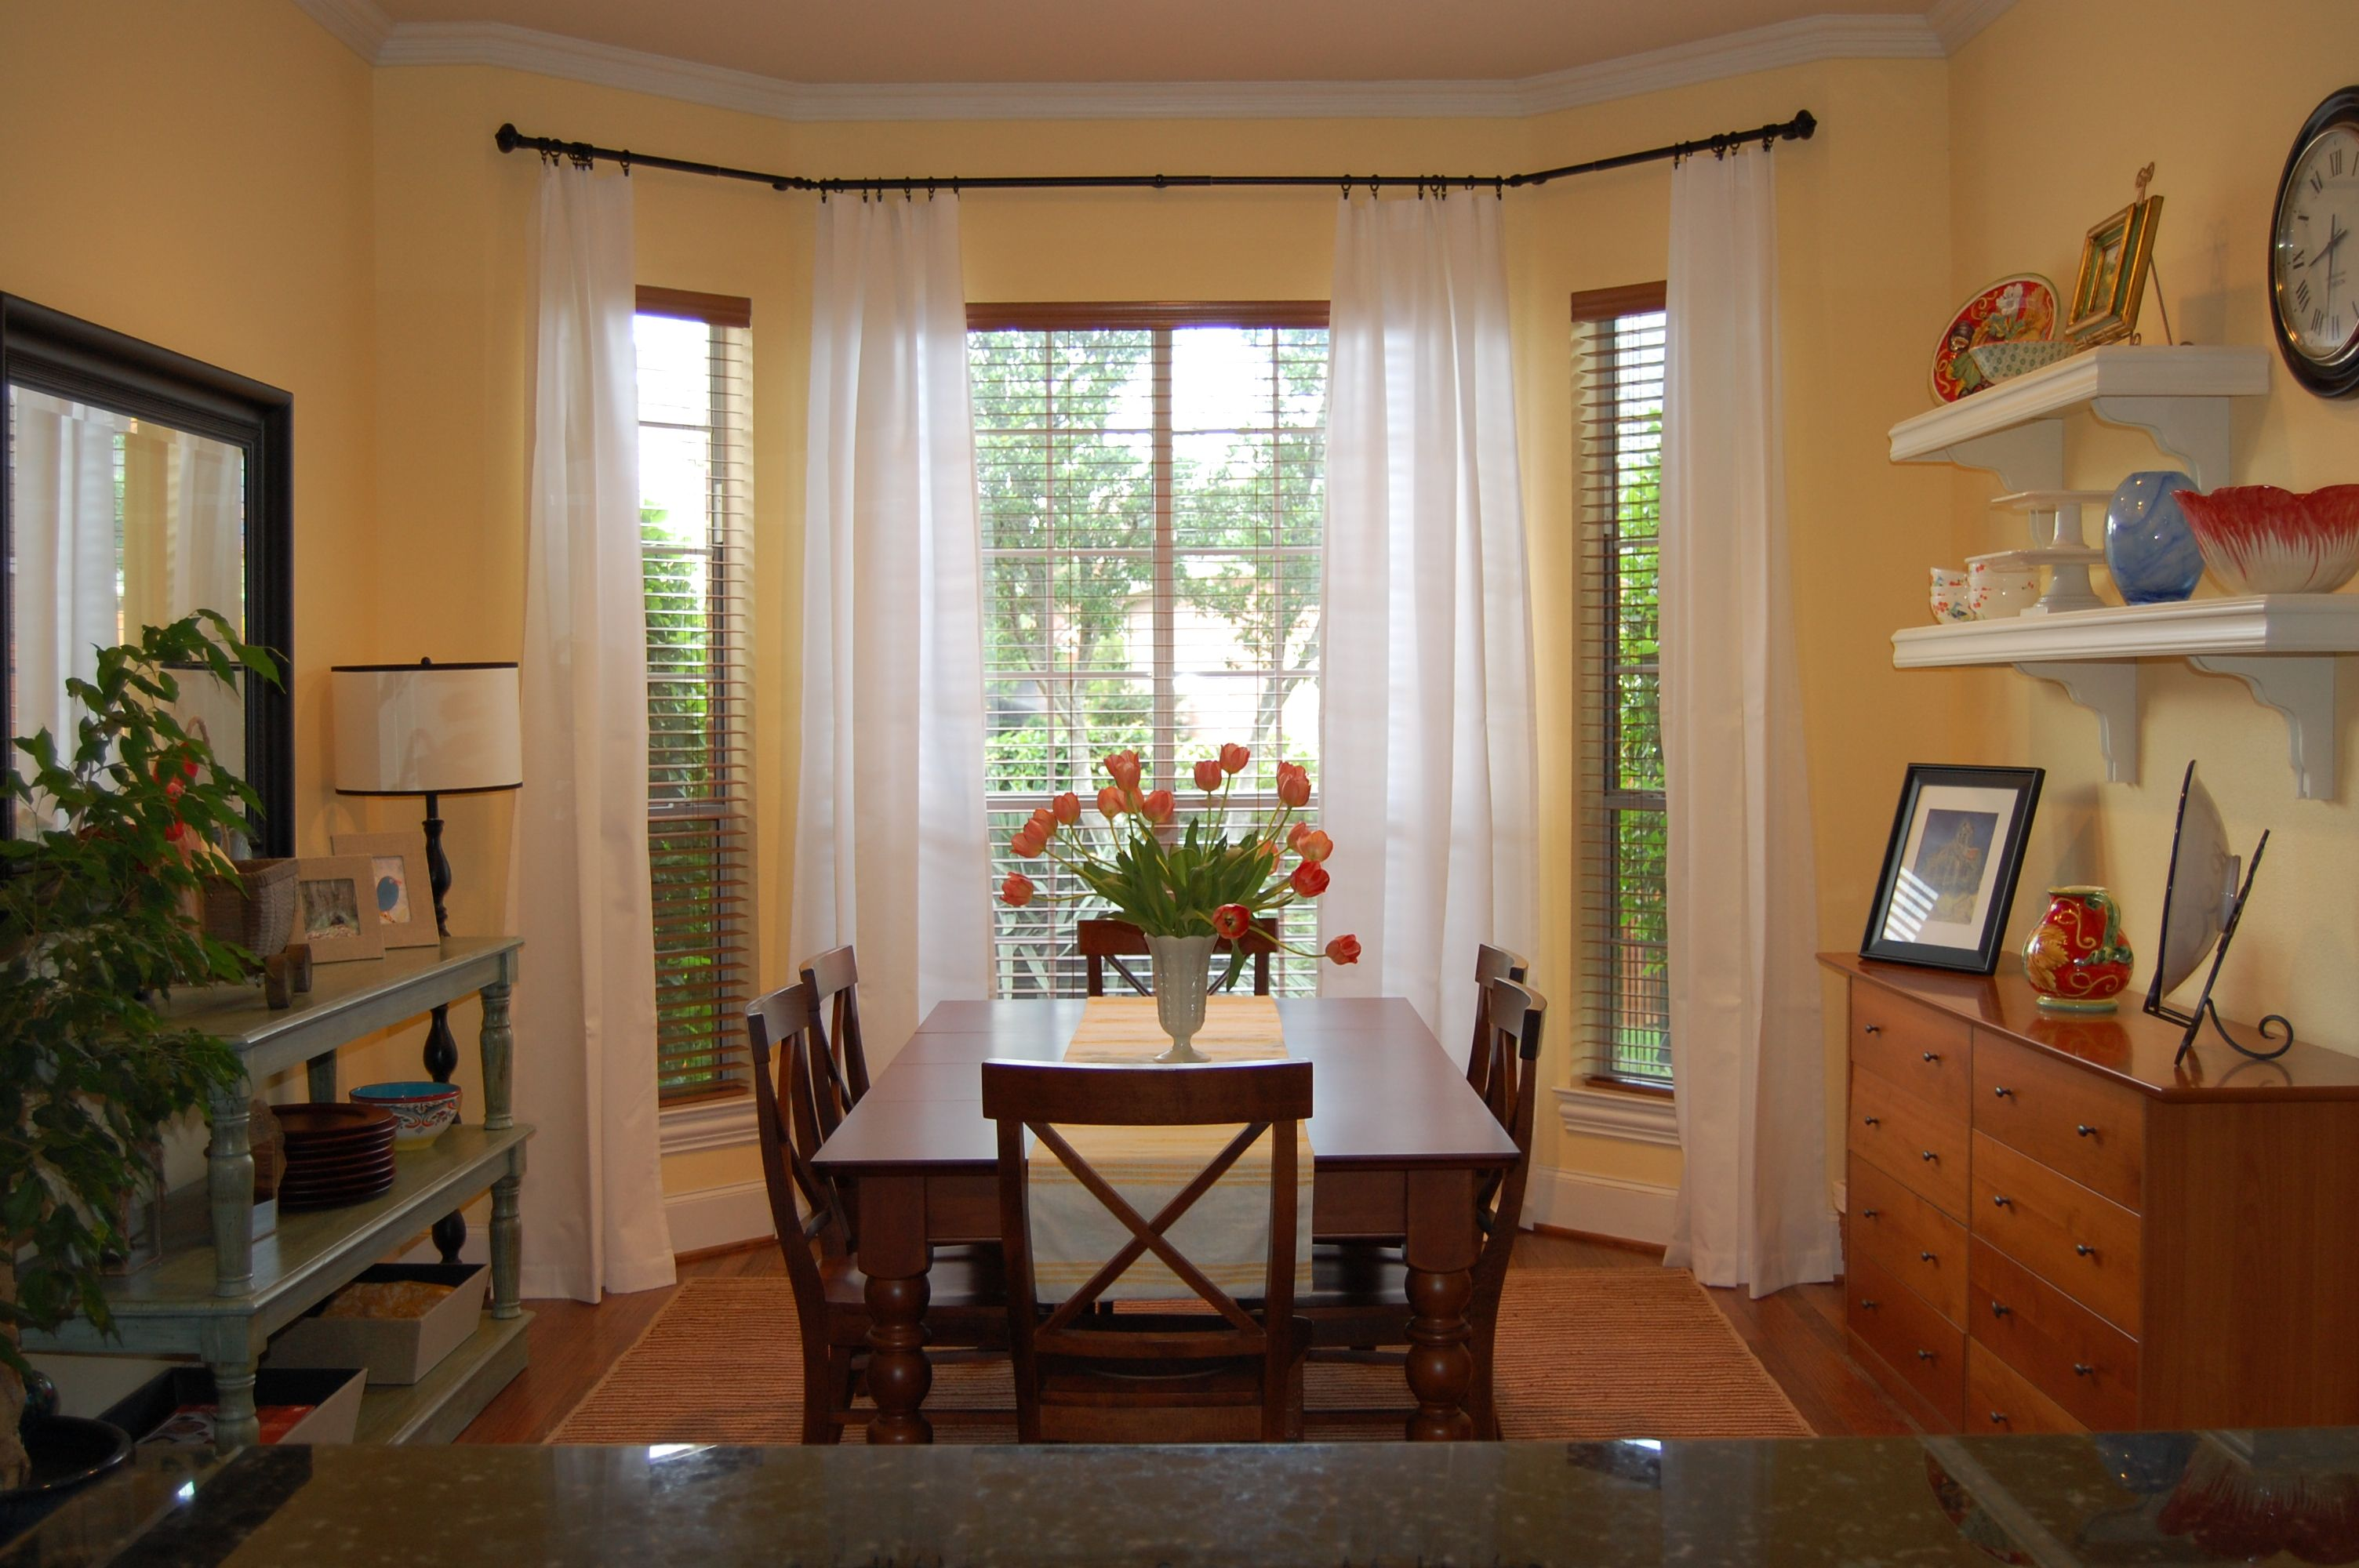 Bed bath and beyond window shades  bay window curtain rods  bay window curtains window curtains and